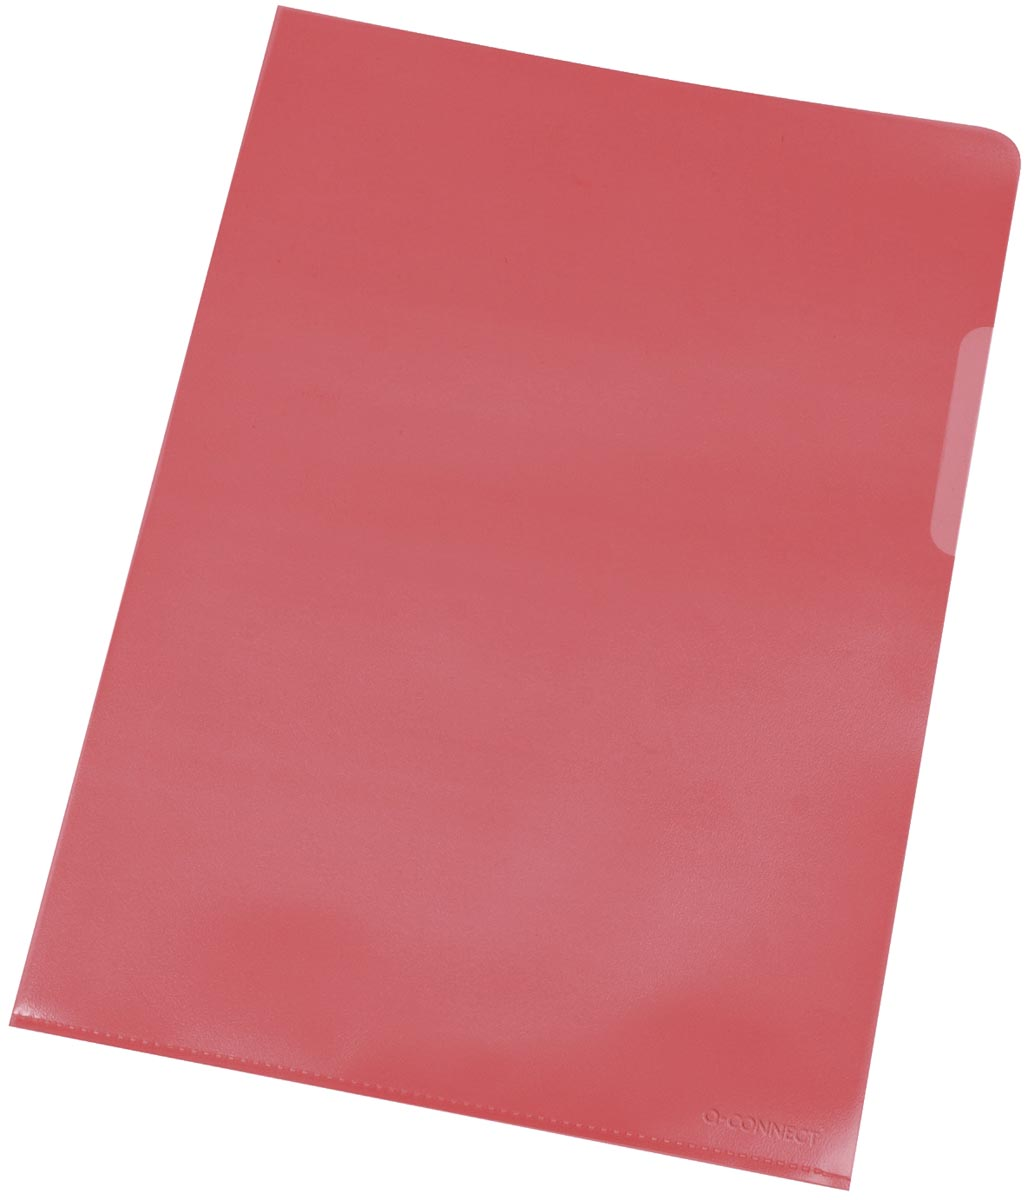 Q-Connect L-map, rood, 120 micron, pak van 10 stuks